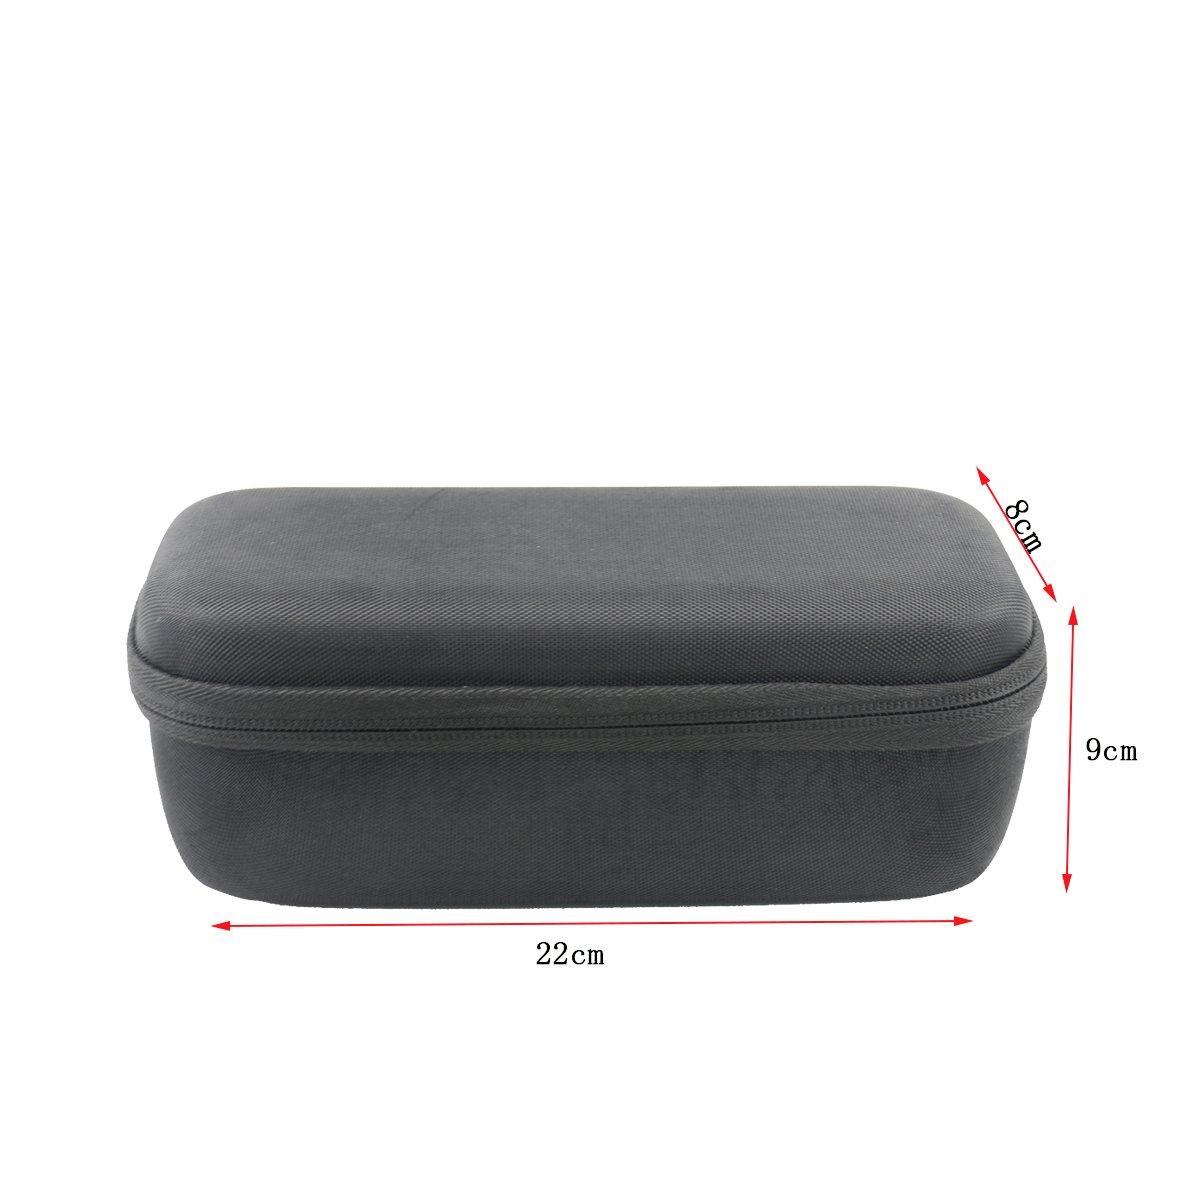 for Anker SoundCore Boost 20W Bluetooth Speaker Hard Case Carrying Travel Bag Cover by SANVSEN